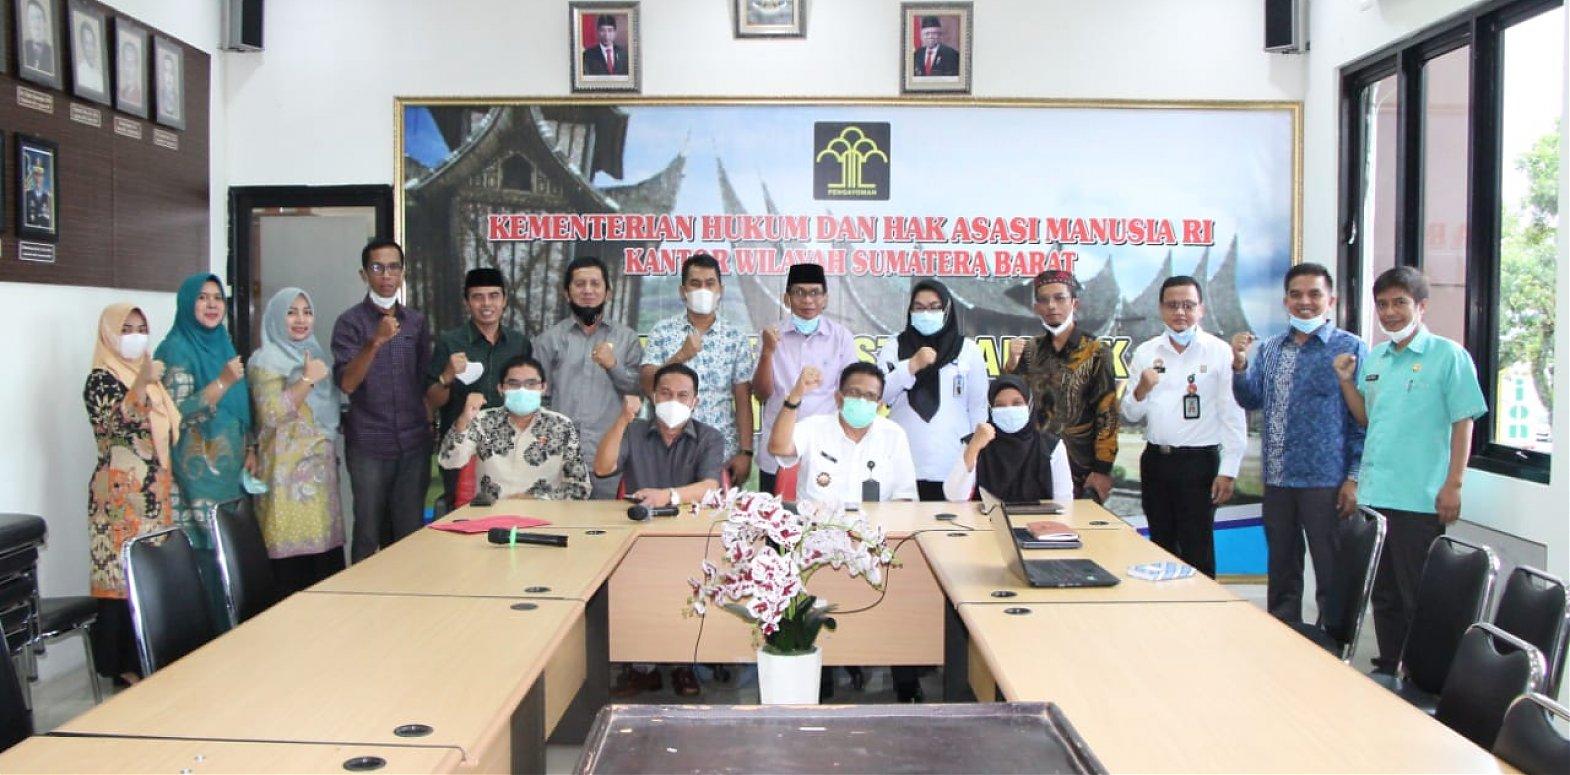 Terkait Ranperda Inisiatif, Komisi II Konsultasi Ke Kanwil Kemenkumham Sumatera Barat